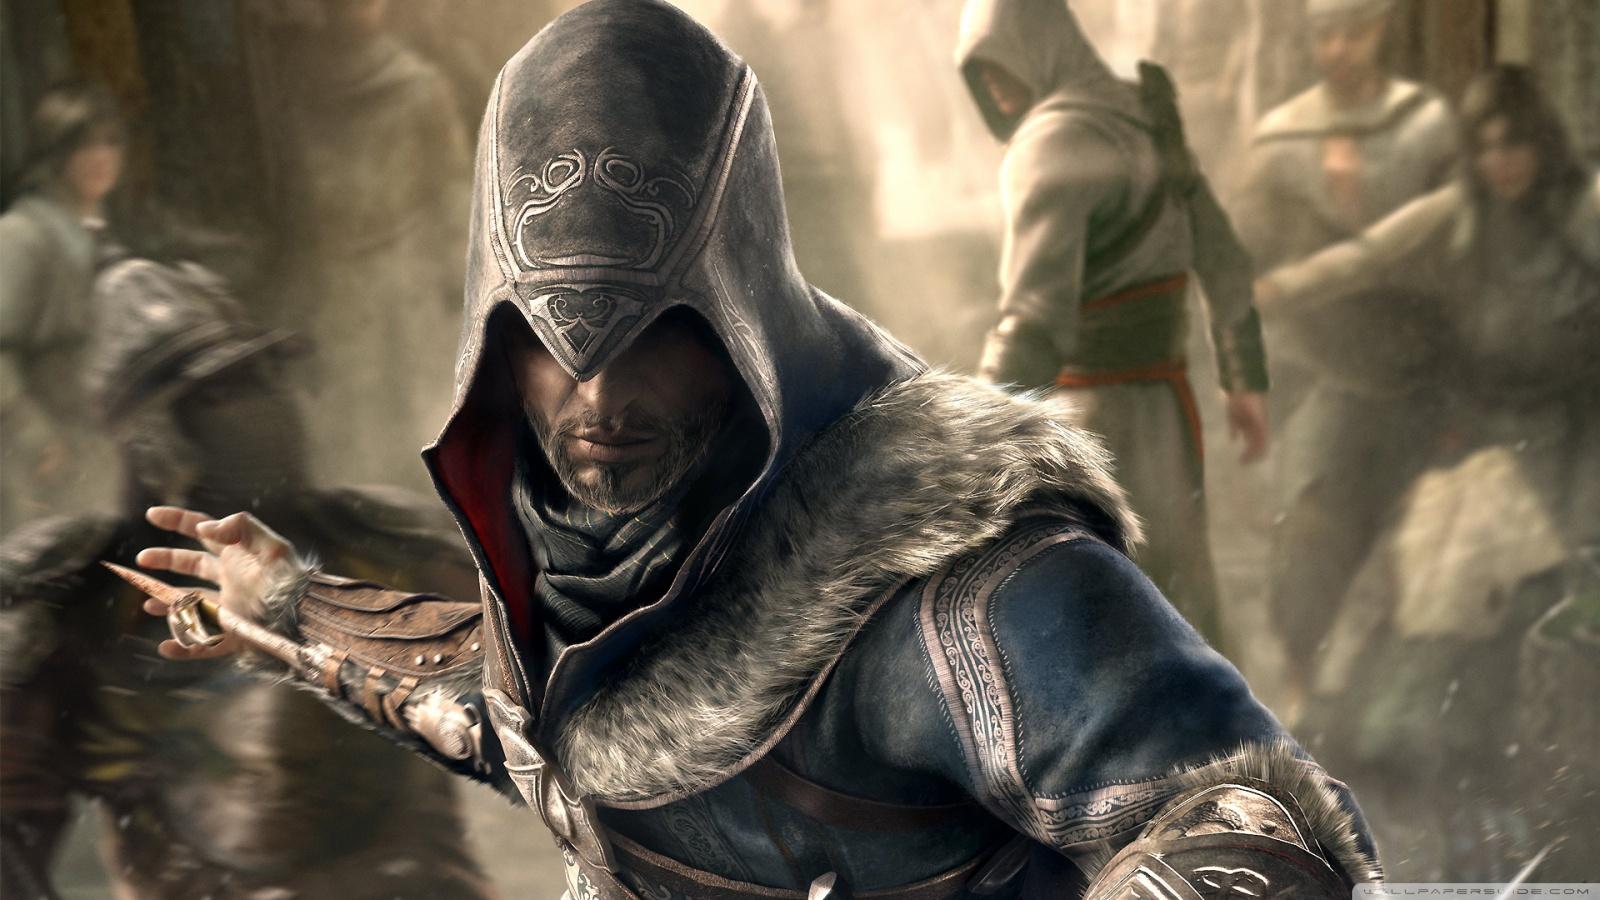 Freaking Spot: Assasin's Creed Full HD 1080p Wallpapers